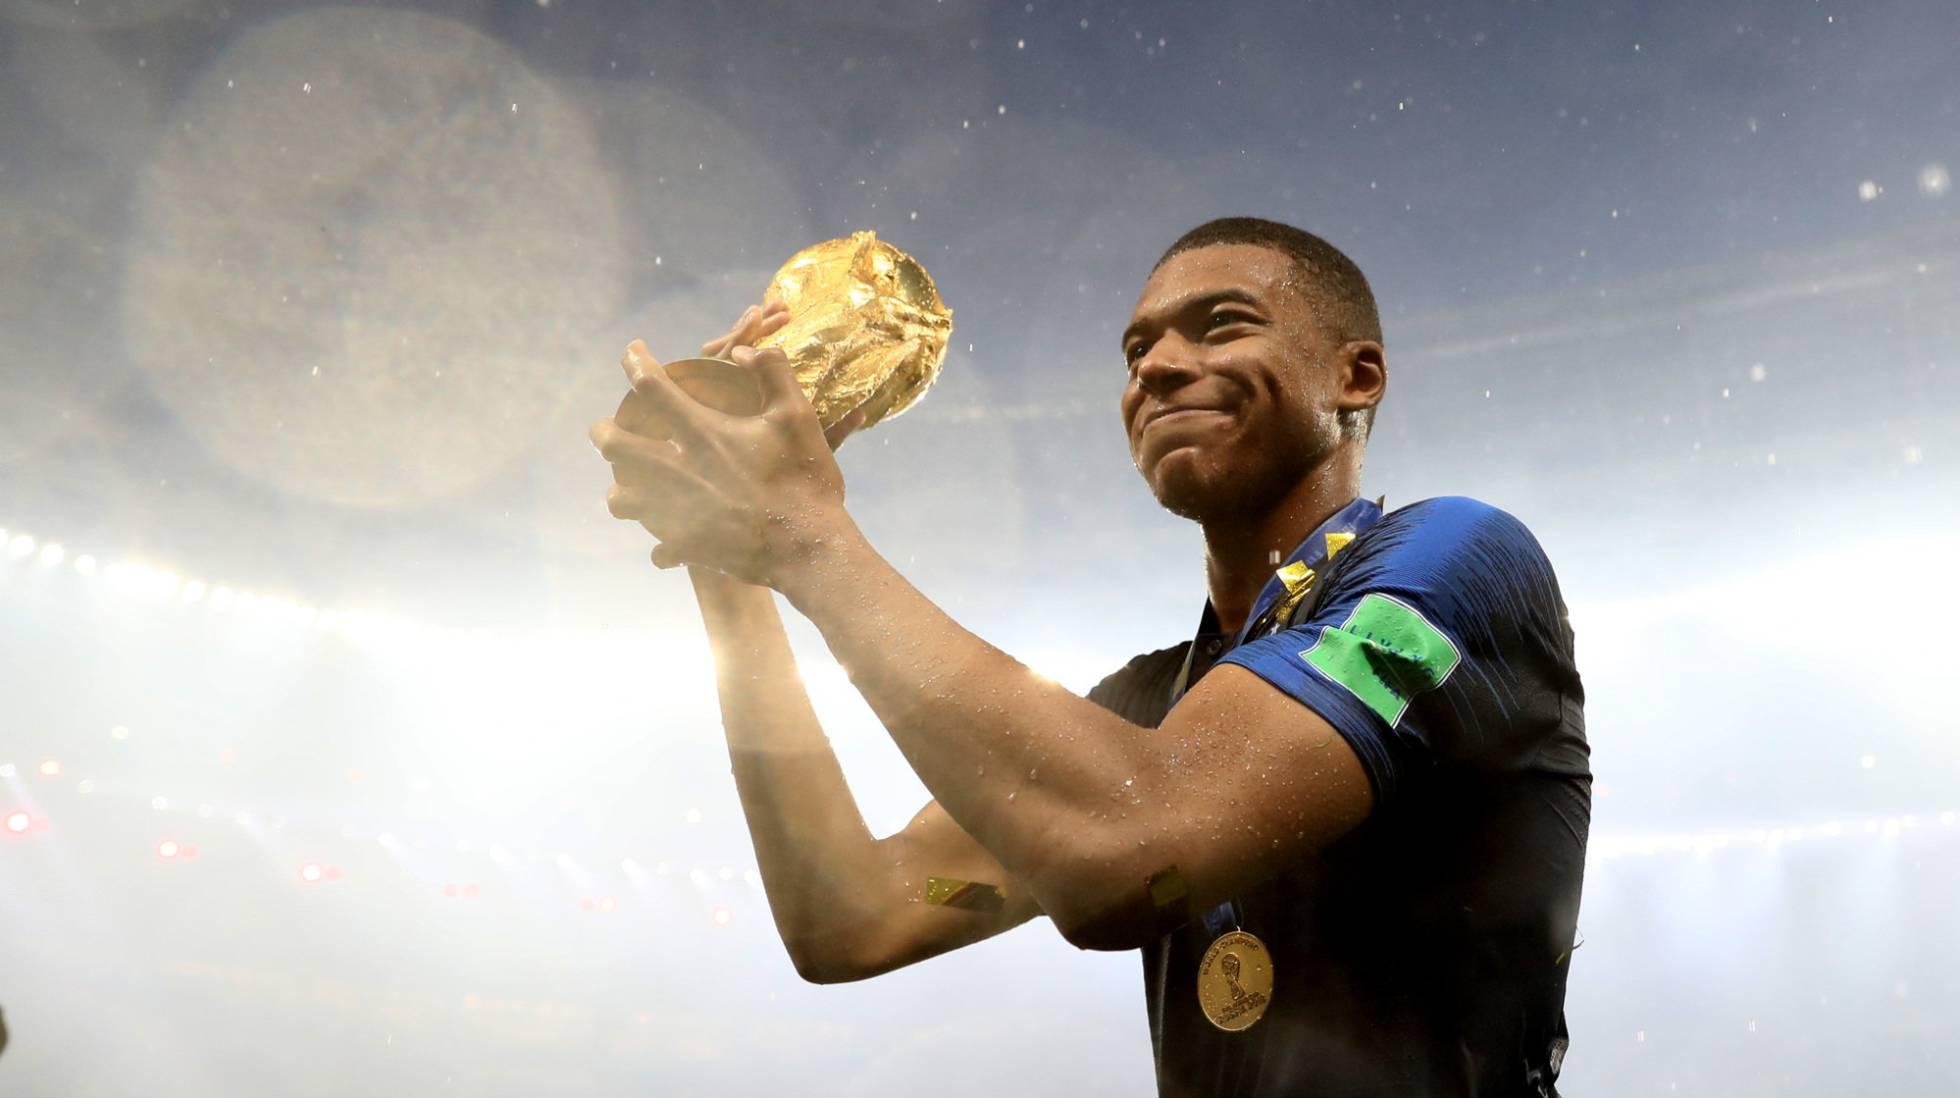 LArs Baron/FIFA